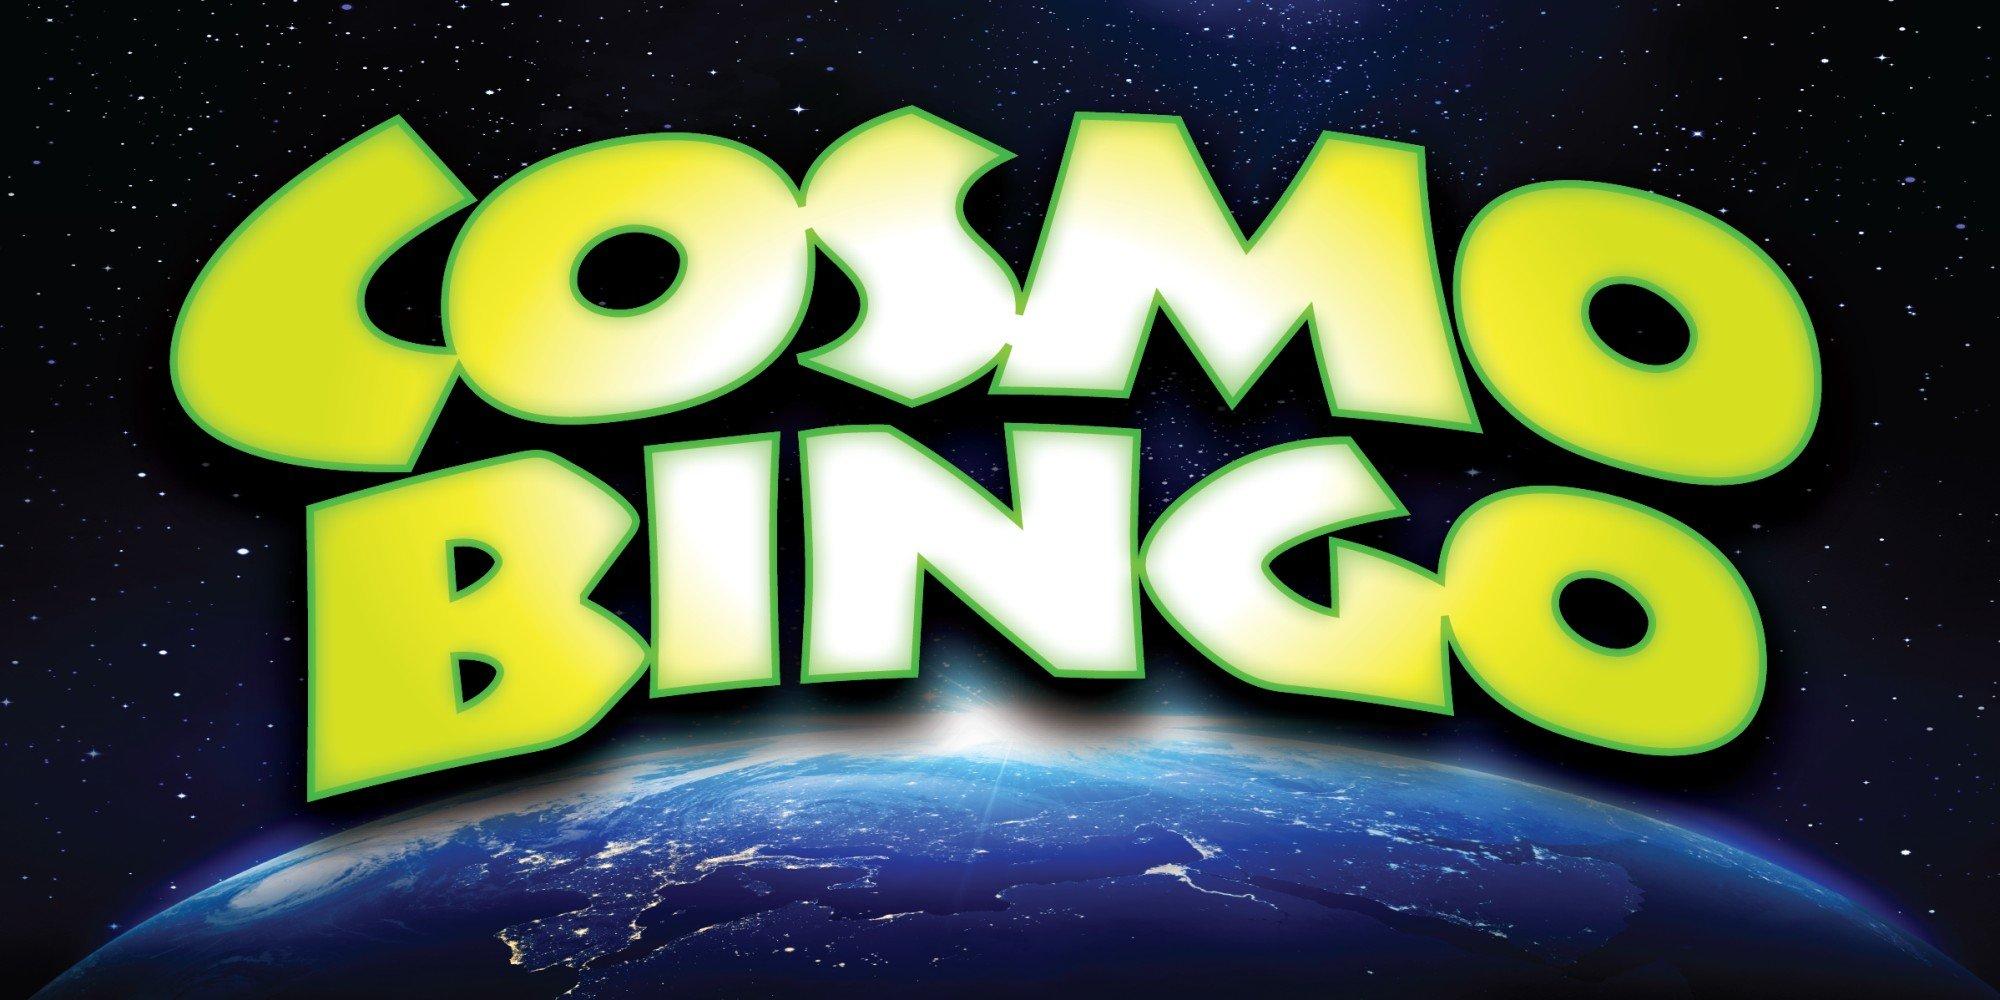 Web Header Promotion-November Cosmo Bingo